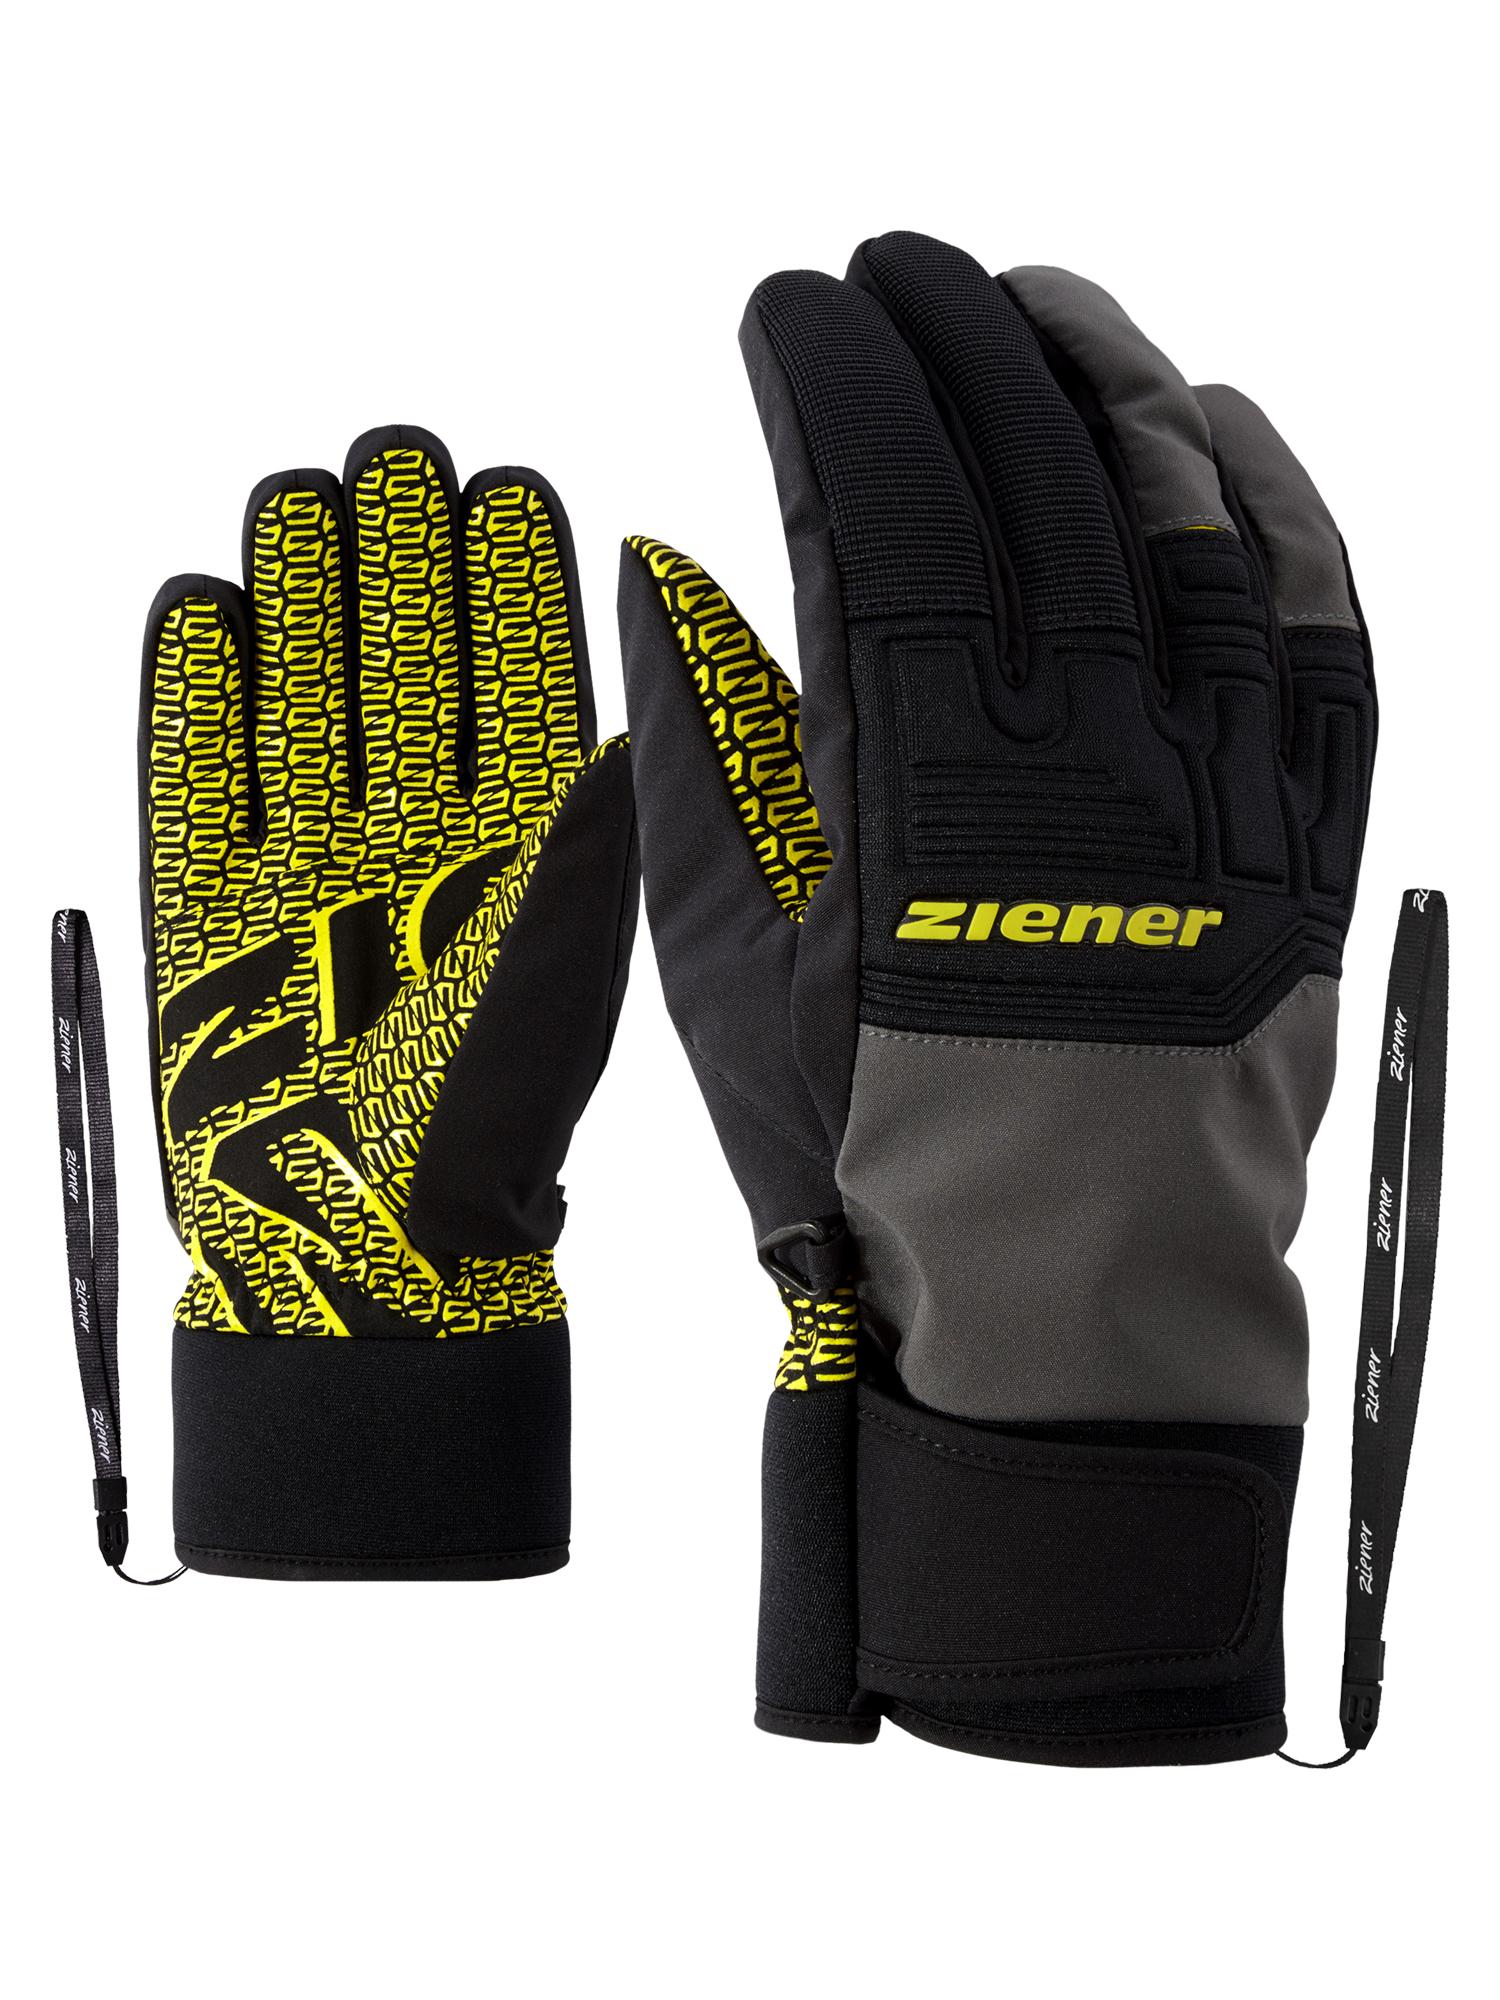 Snowboard Handschuhe Gloves ZIENER AGIL AS JUNIOR Handschuh 2020 black magnet